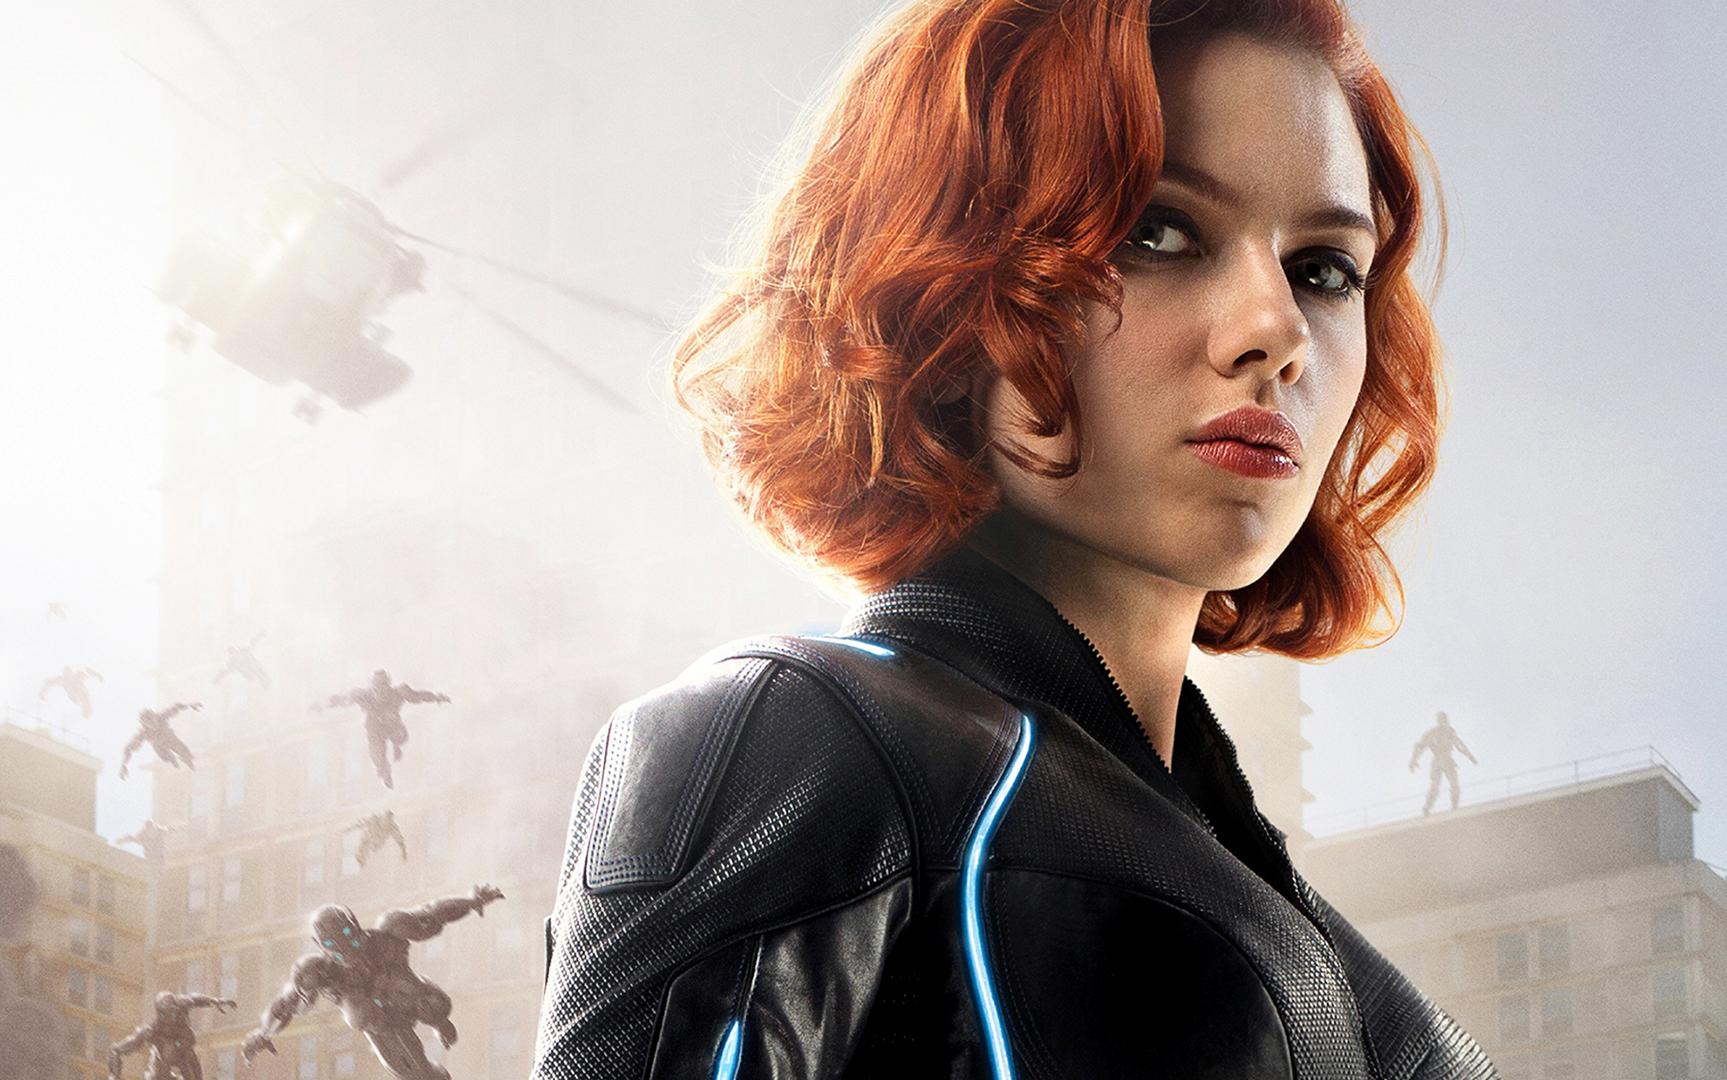 65+] Scarlett Johansson Black Widow Wallpaper on WallpaperSafari